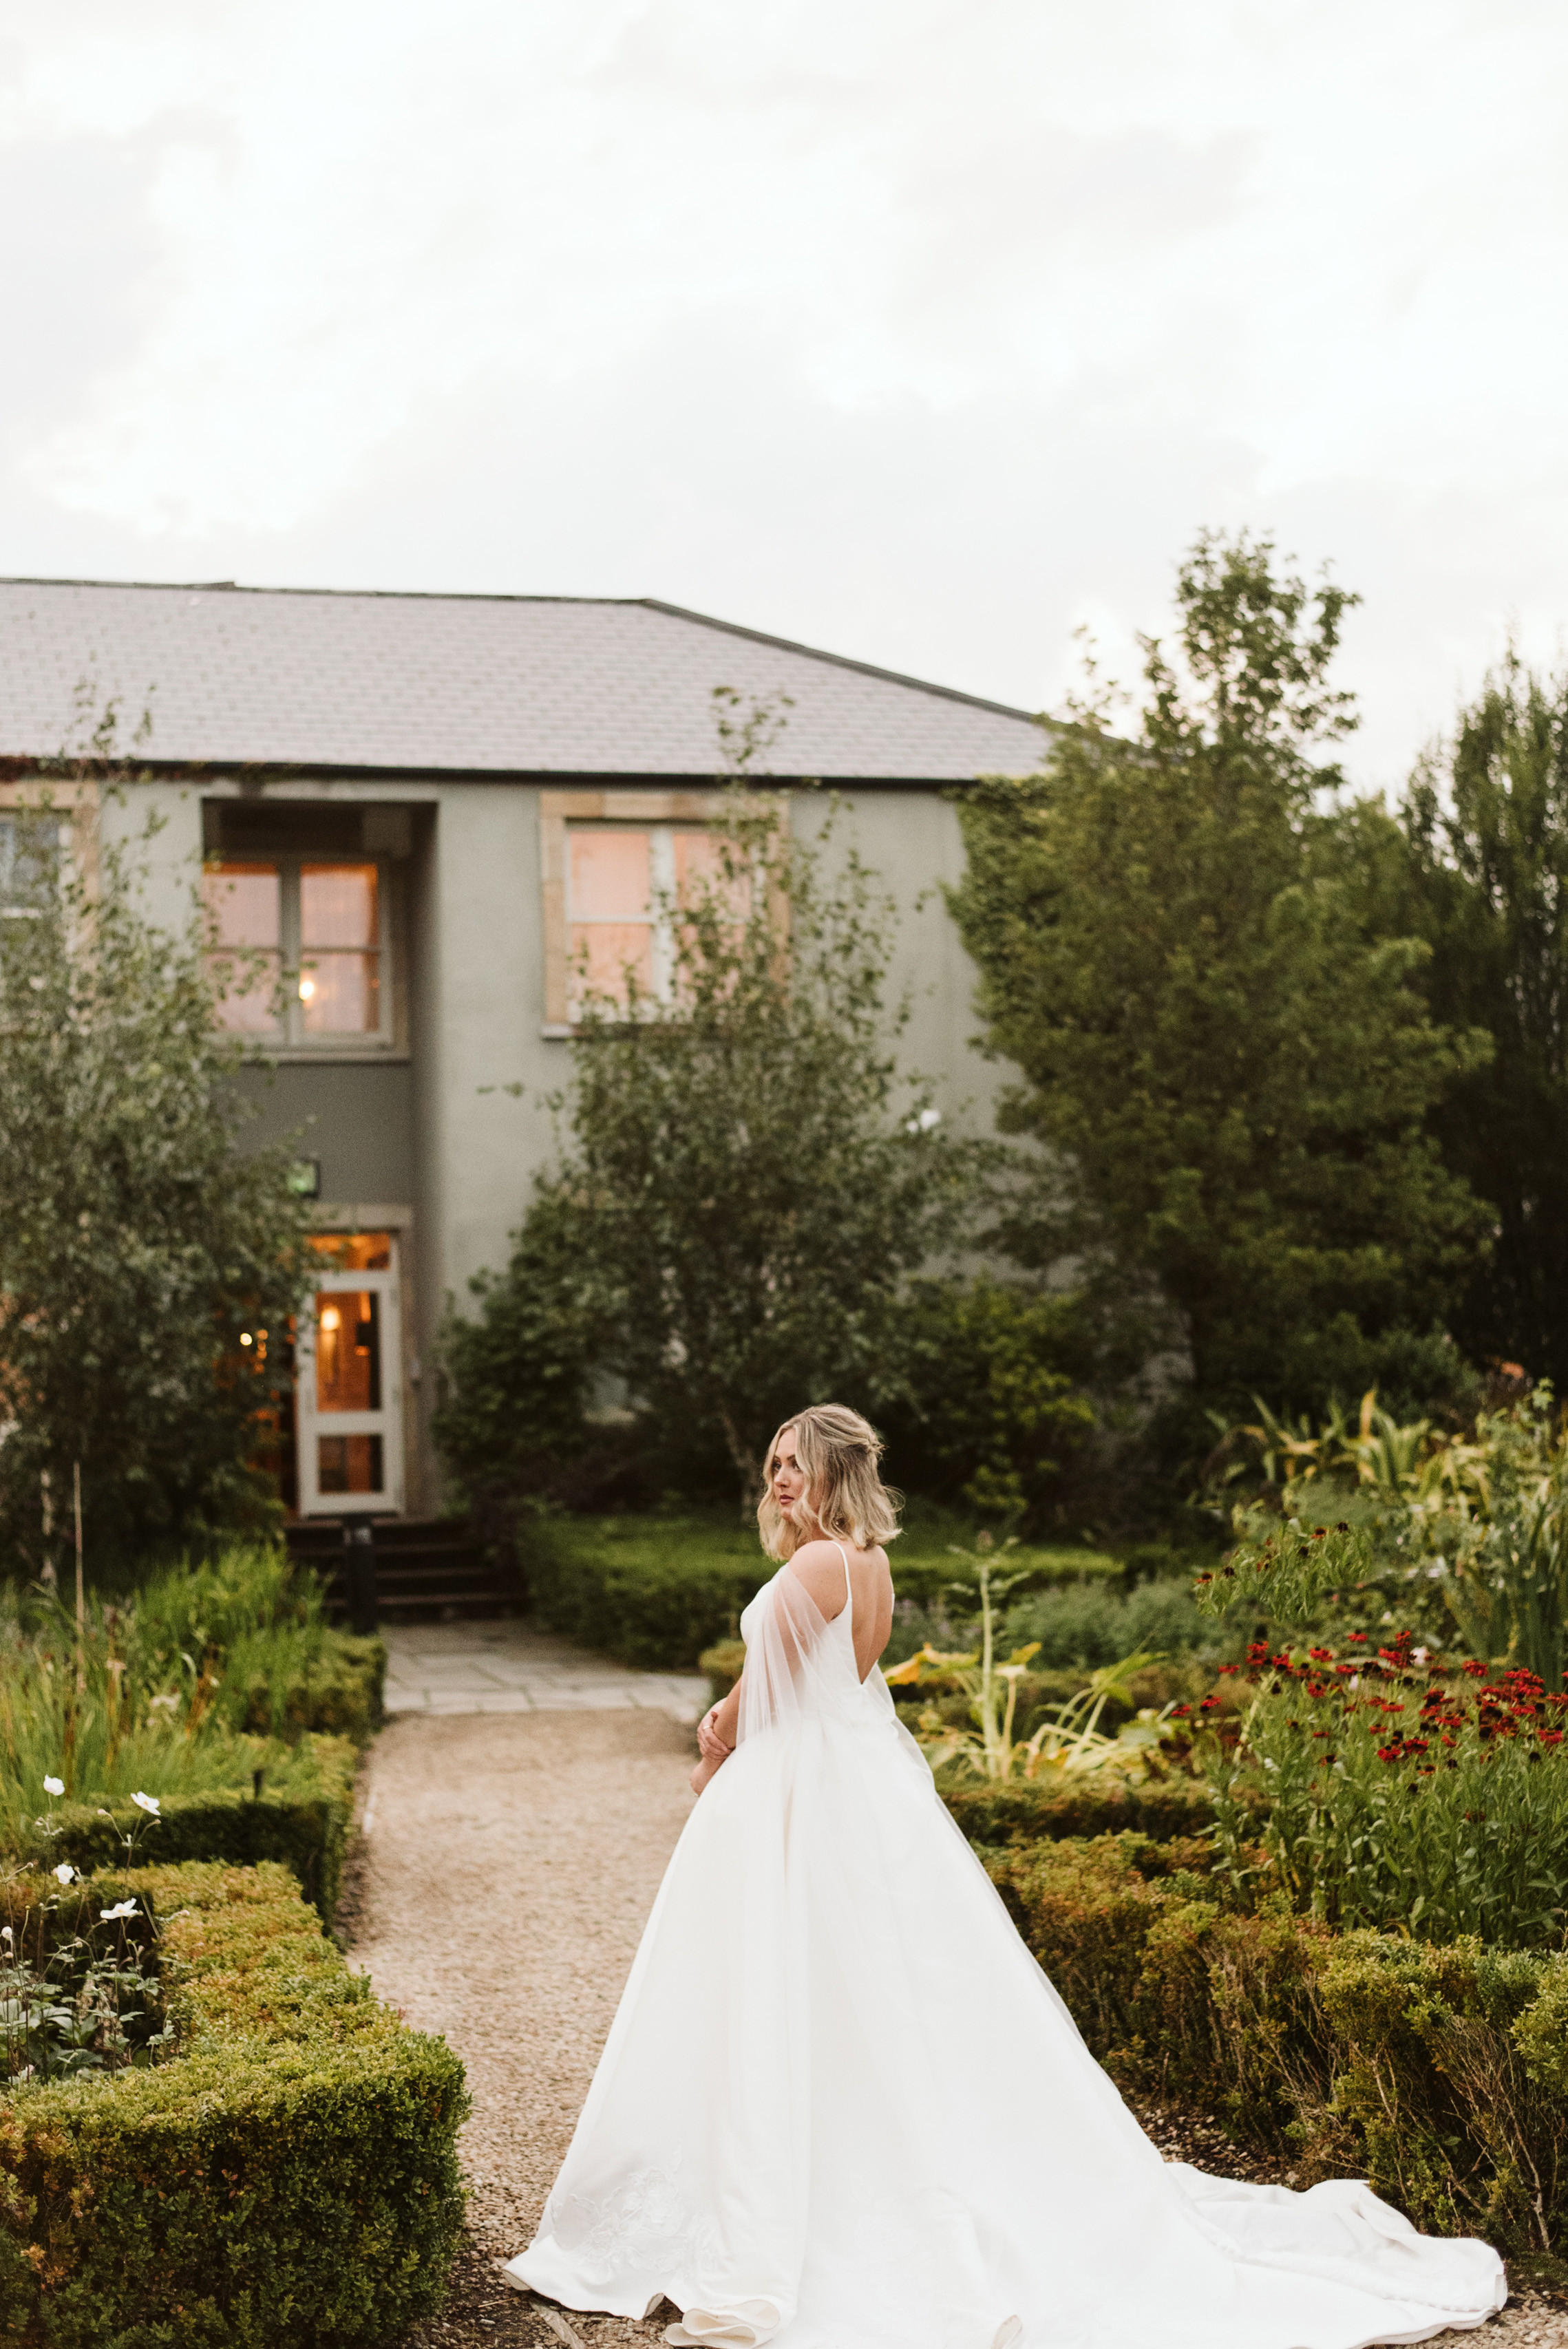 Bride walking through Gardens of Lough Eske Castle in Ireland in a mikado ballgown wedding dress and tulle cape